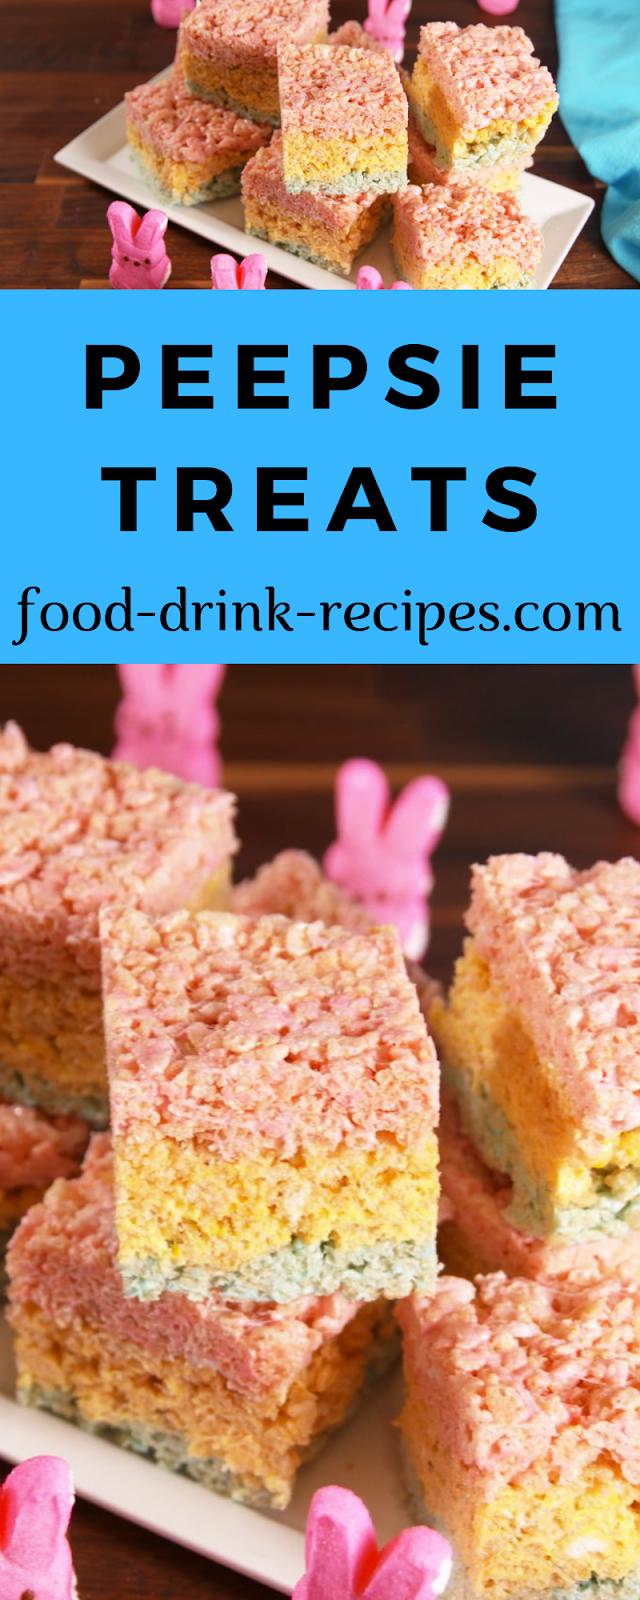 Peepsie Treats - food-drink-recipes.com